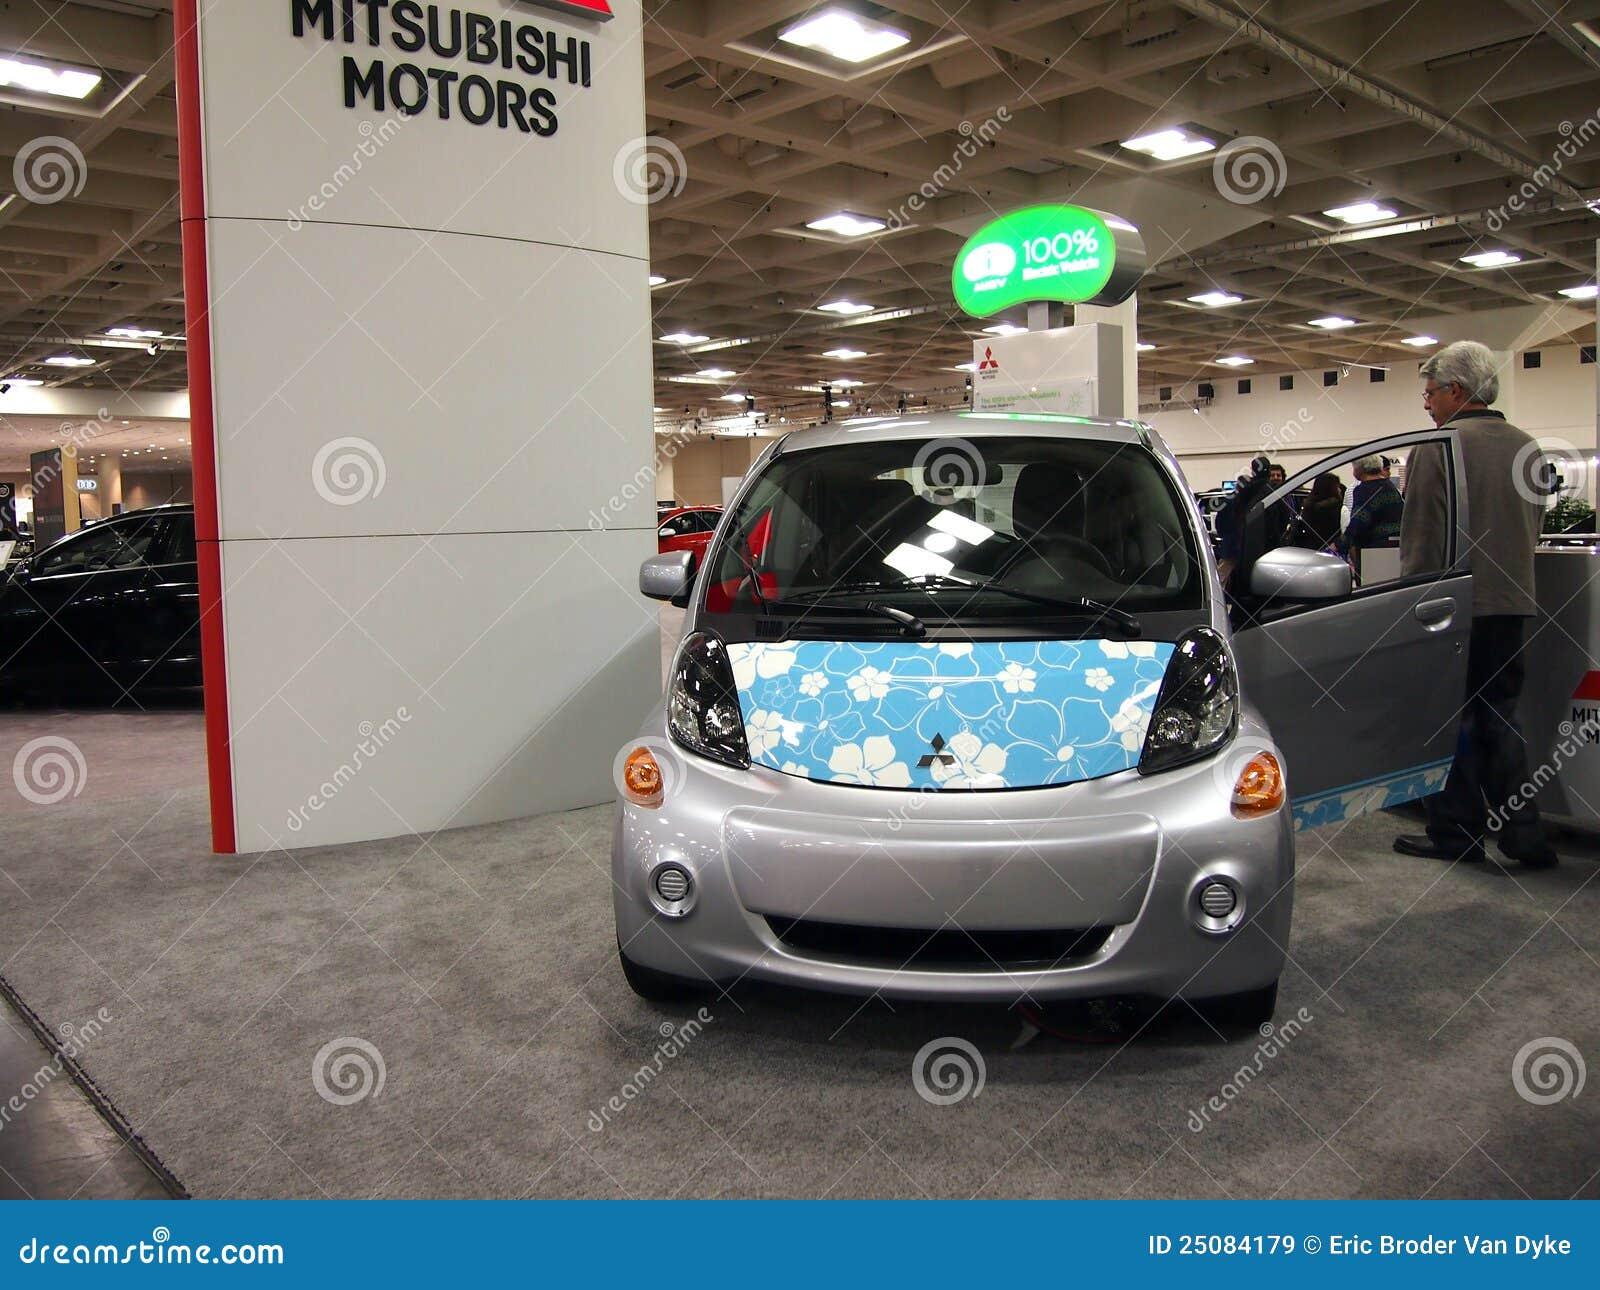 Mitsubishi Motors Company Logo In Front Of Dealership